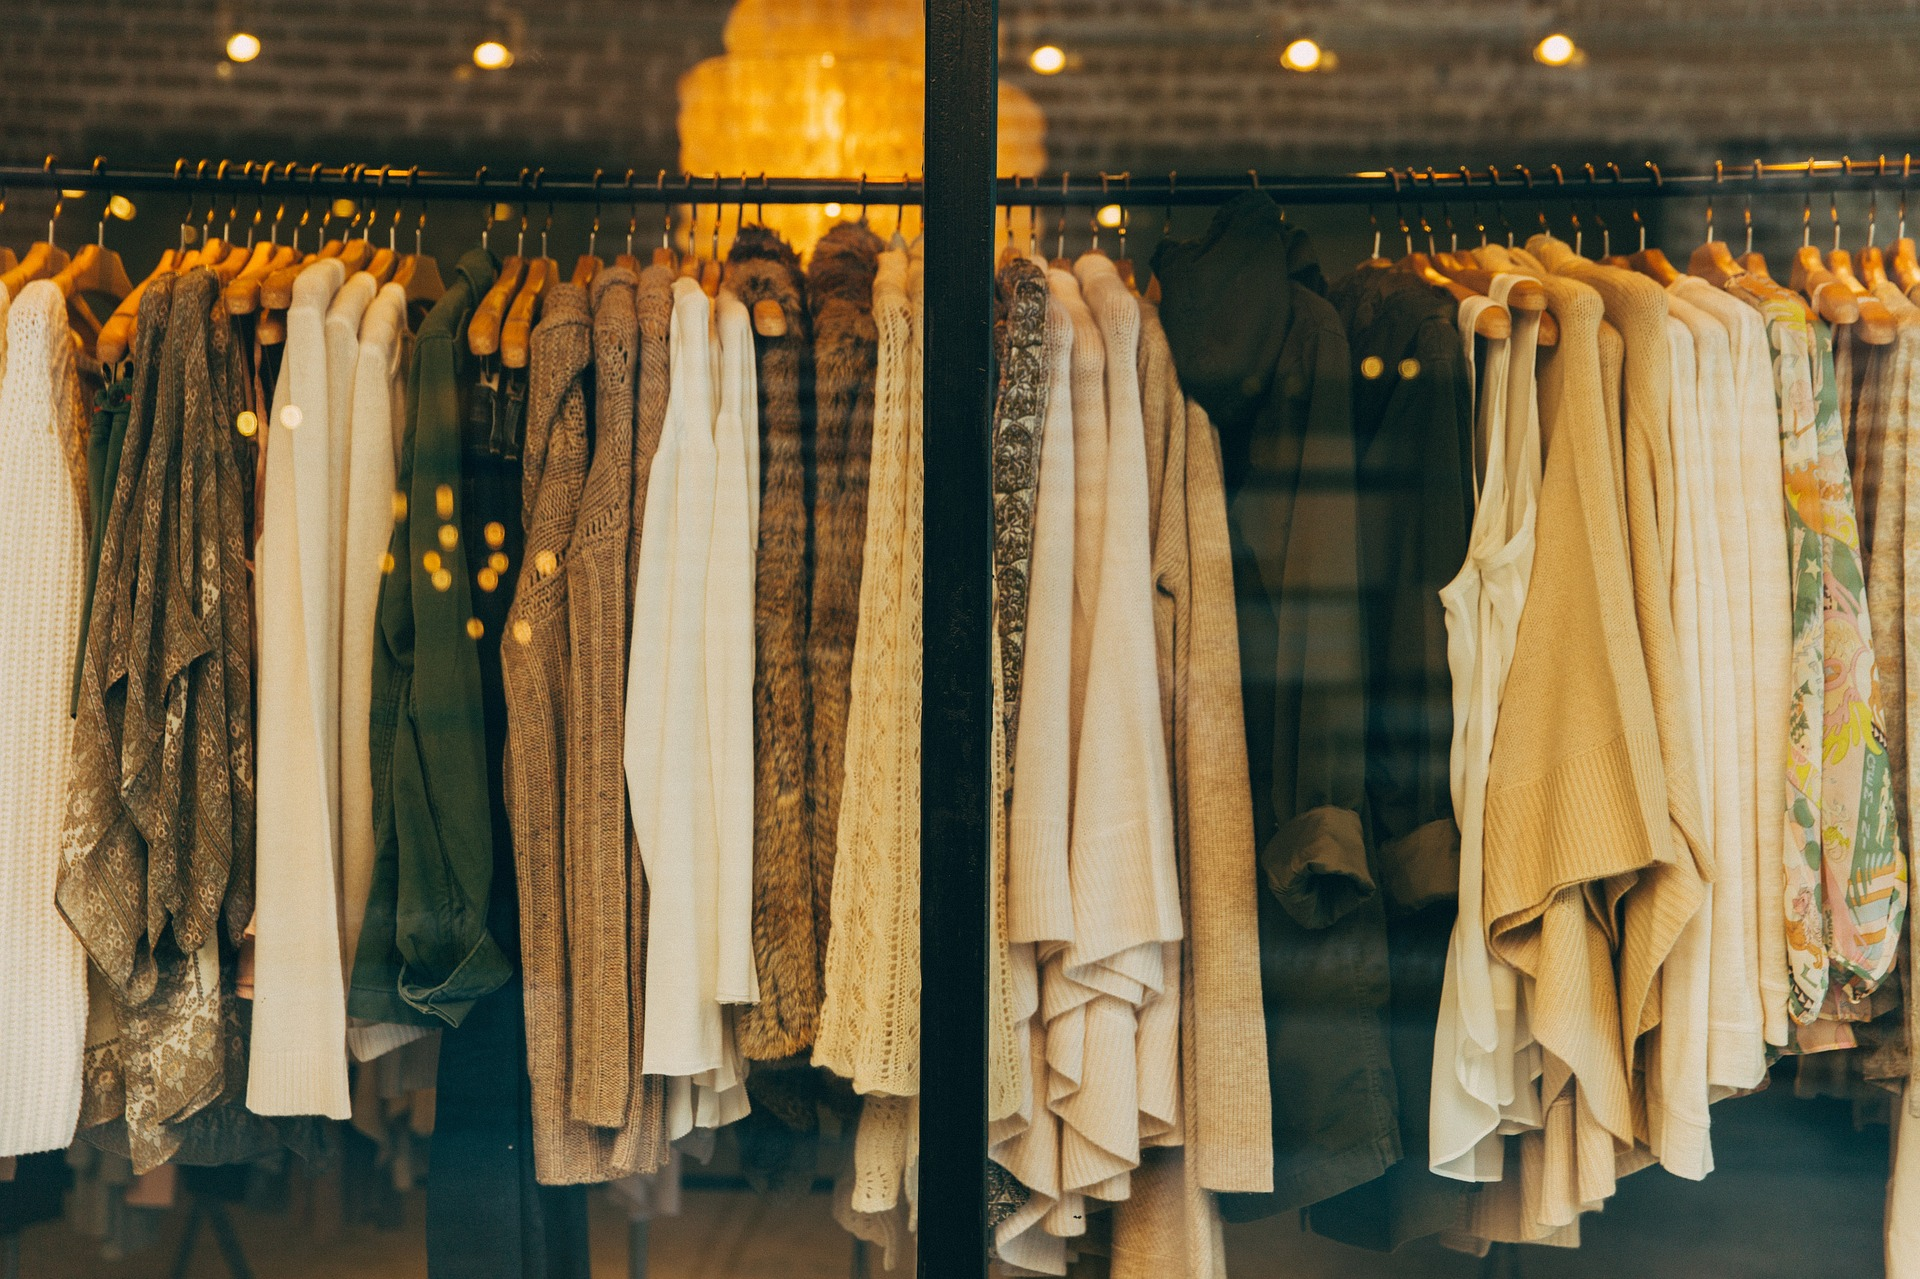 kledingwinkel SHOPFOTO 2019.jpg